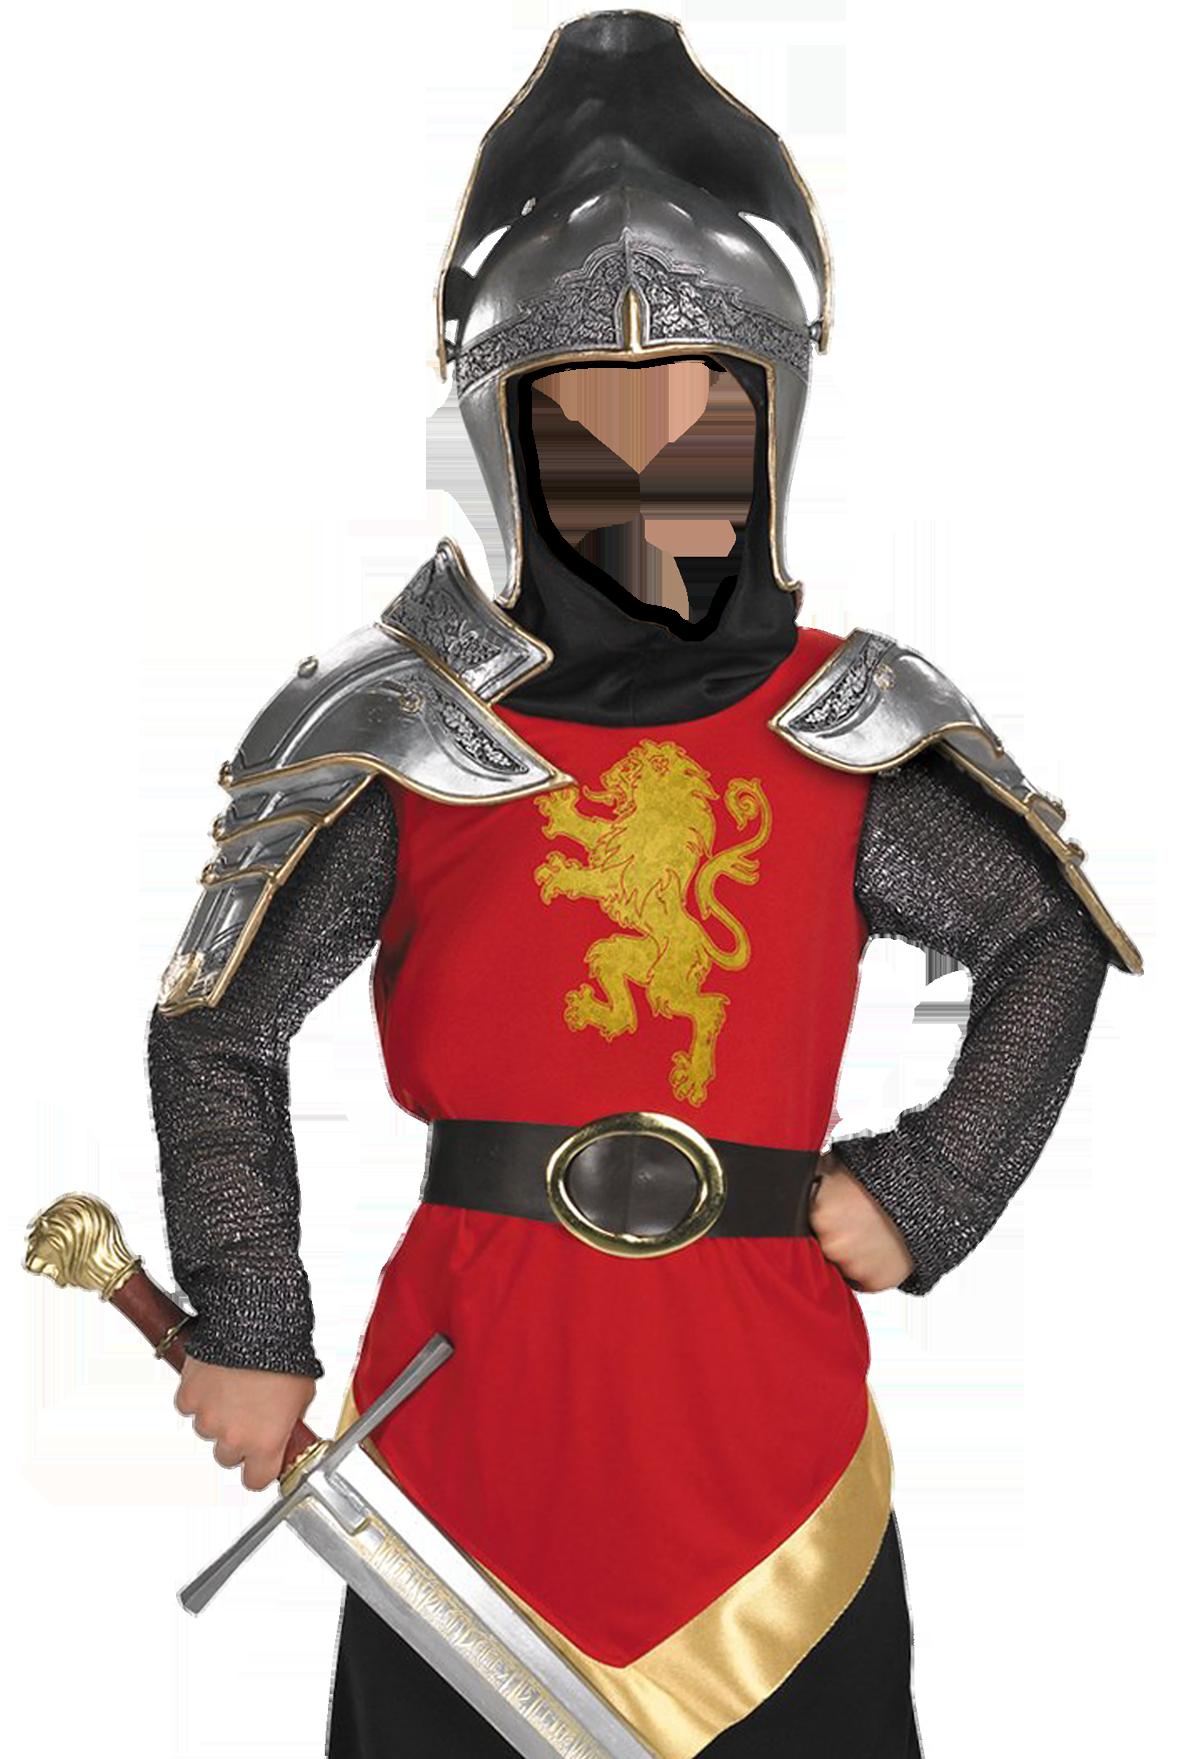 Элемент рыцарского костюма своими руками